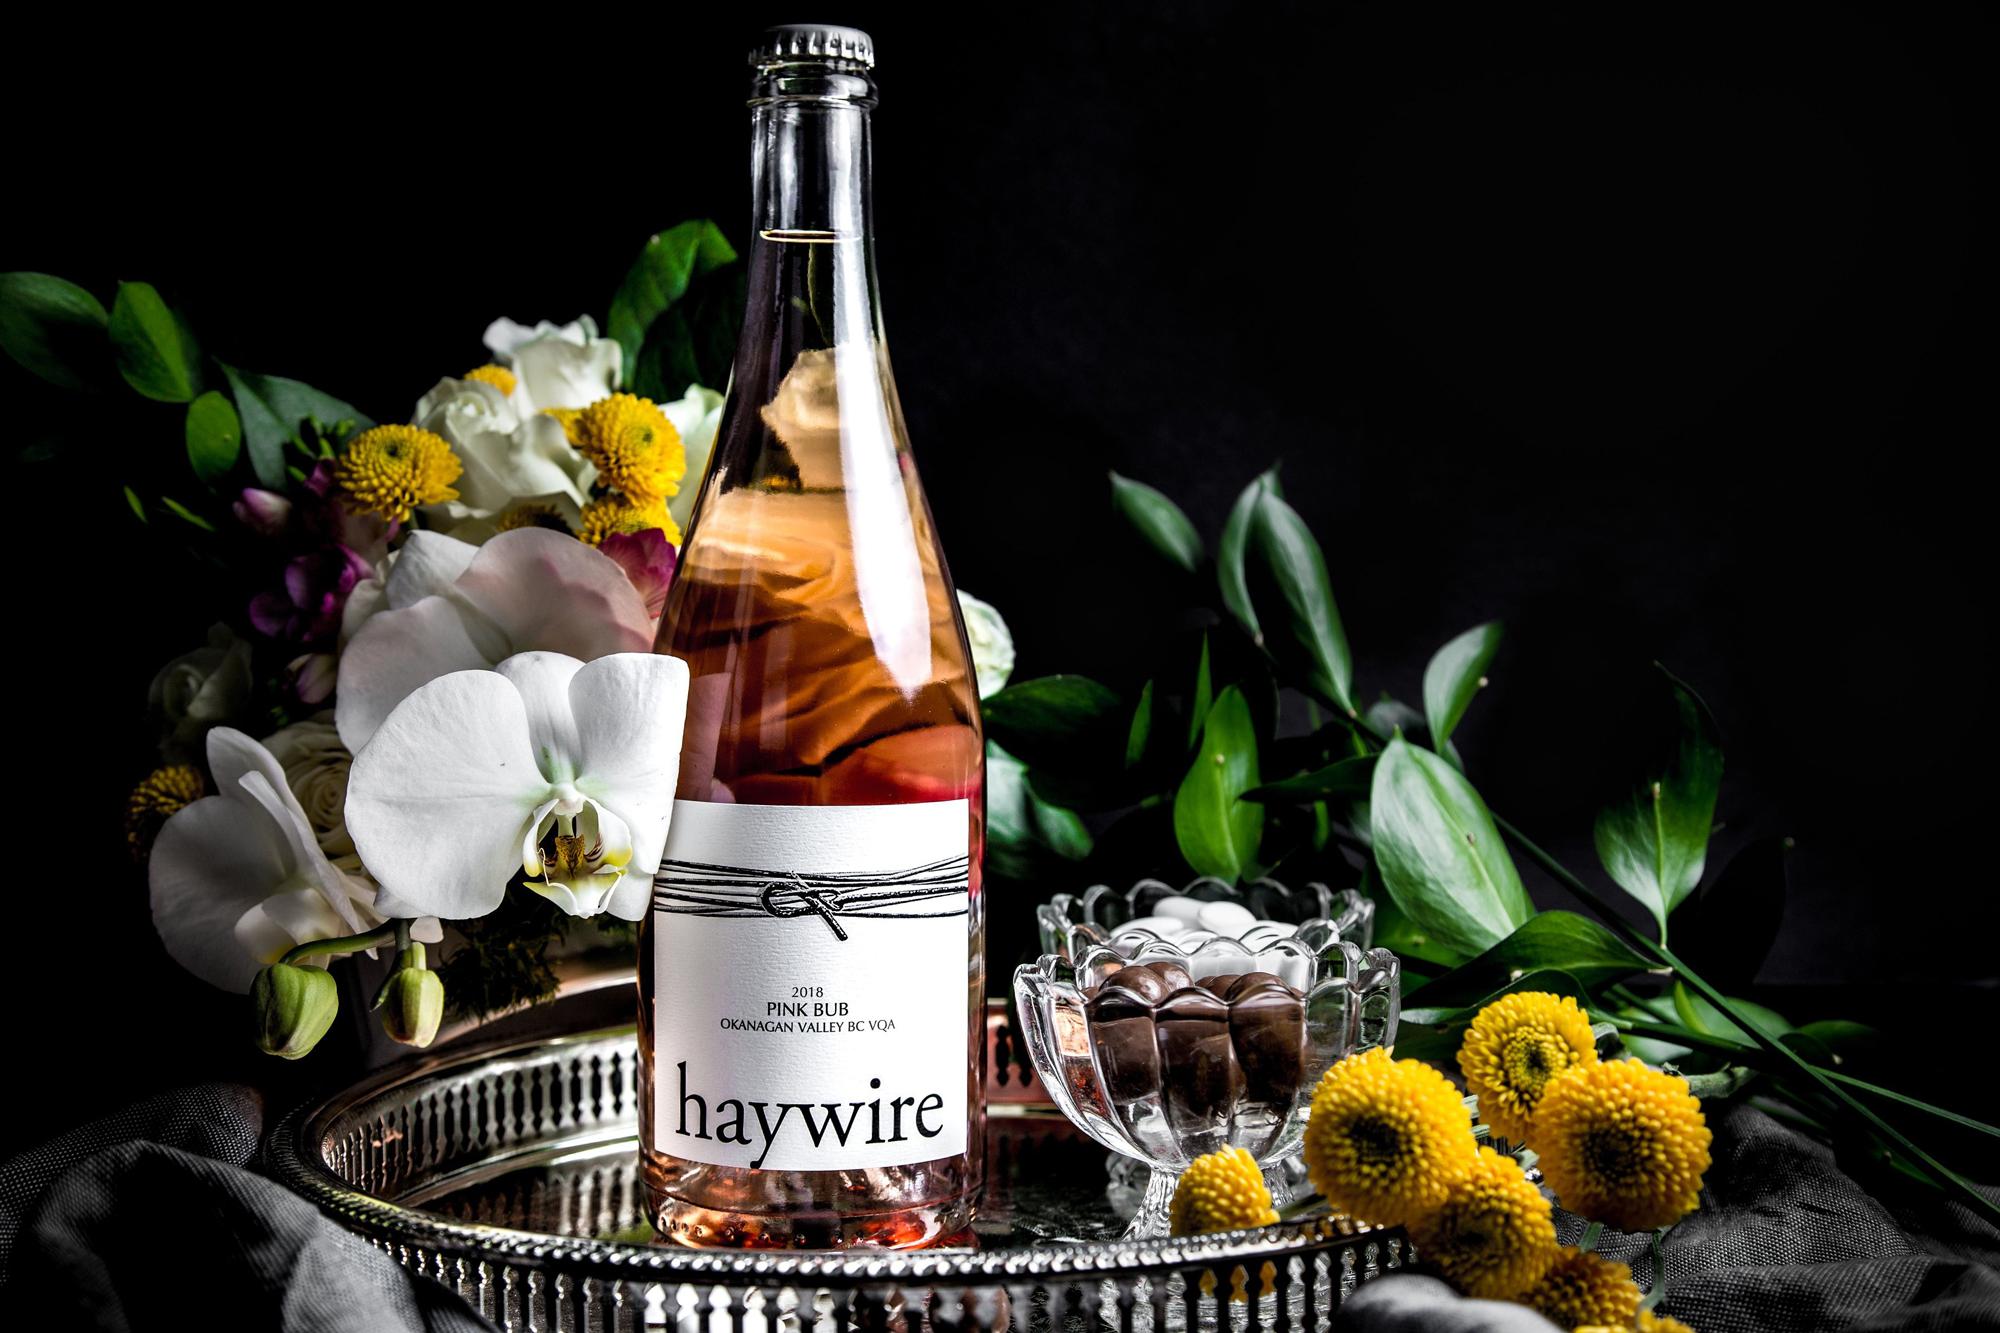 2018-Haywire_Pink_Bub_Sparkling_Wine_2_Credit_Leila_Kwok.jpg